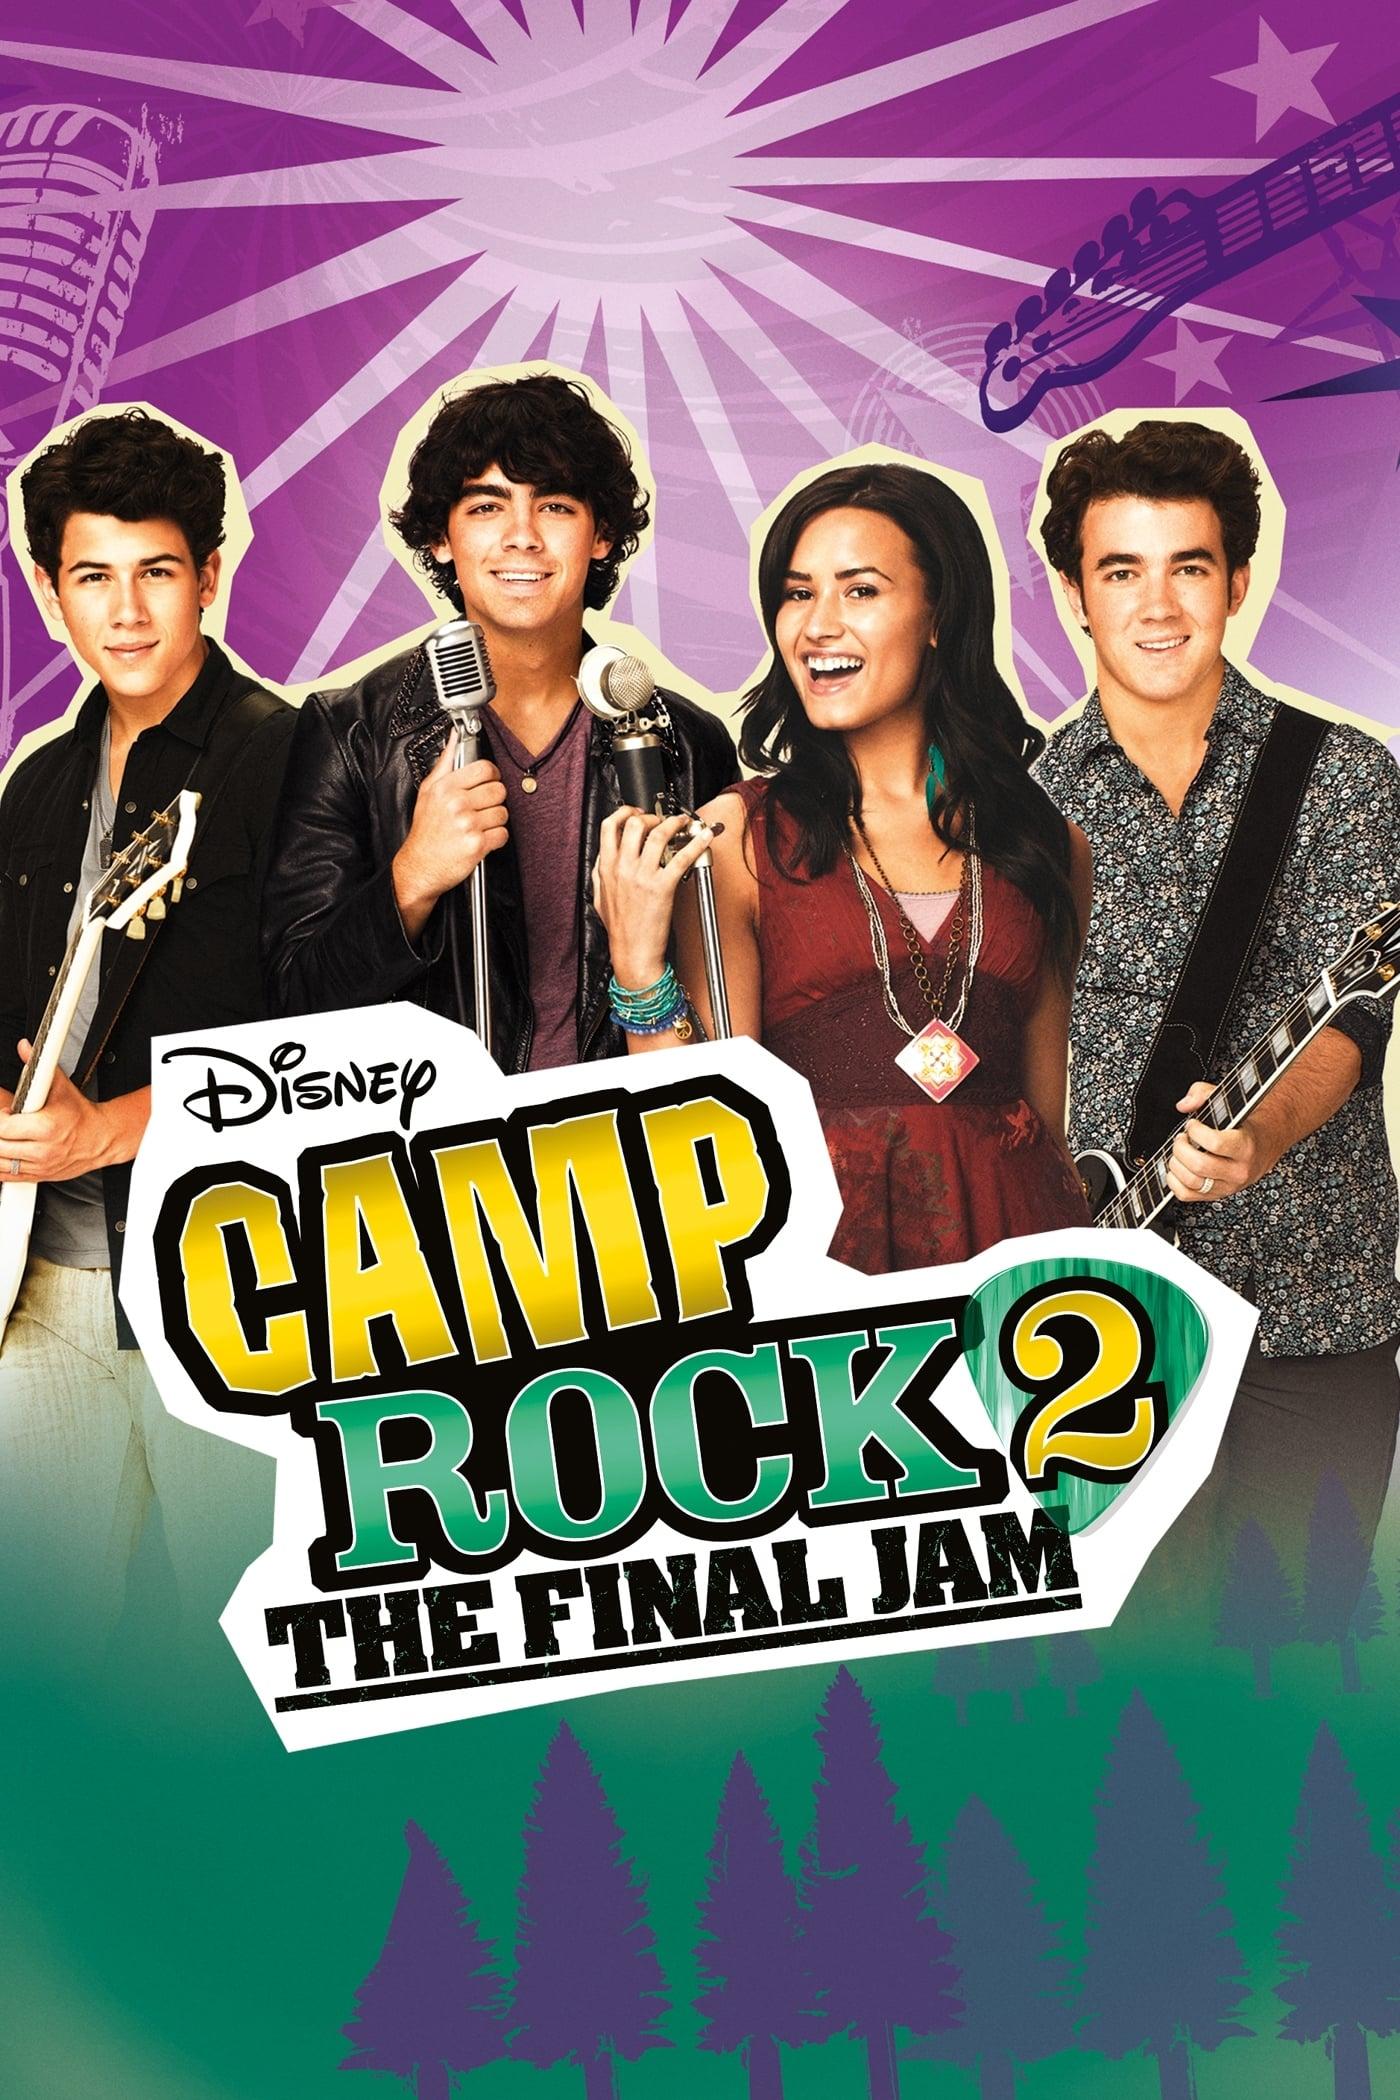 Camp Rock 2 The Final Jam Movie Streaming Online Watch On Jio Cinema